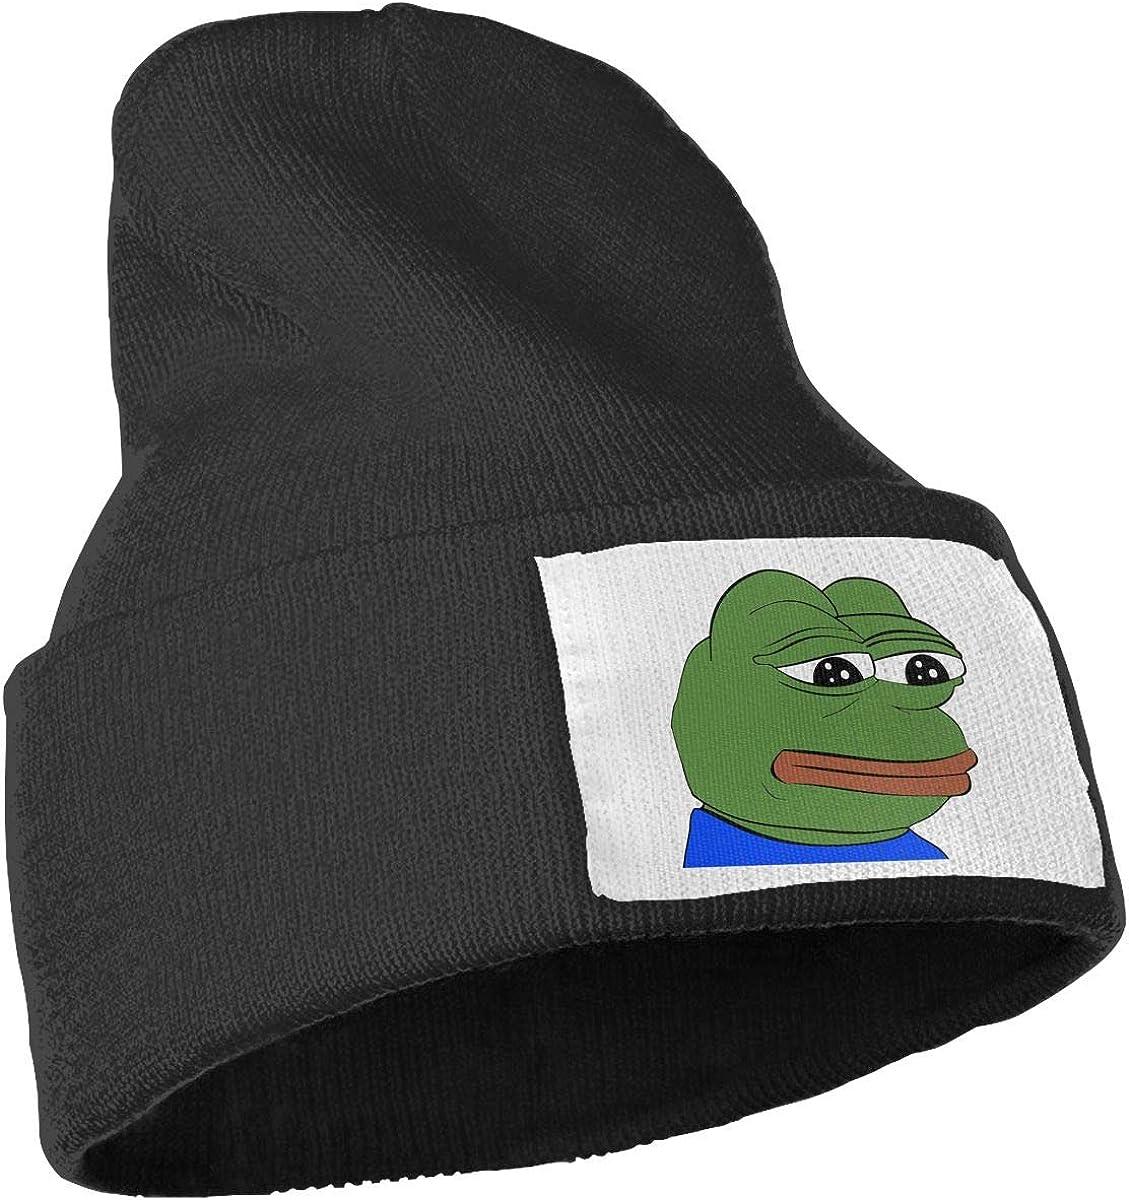 Pepe The Frog Logo Beanie Hat Winter Solid Warm Knit Unisex Ski Skull Cap